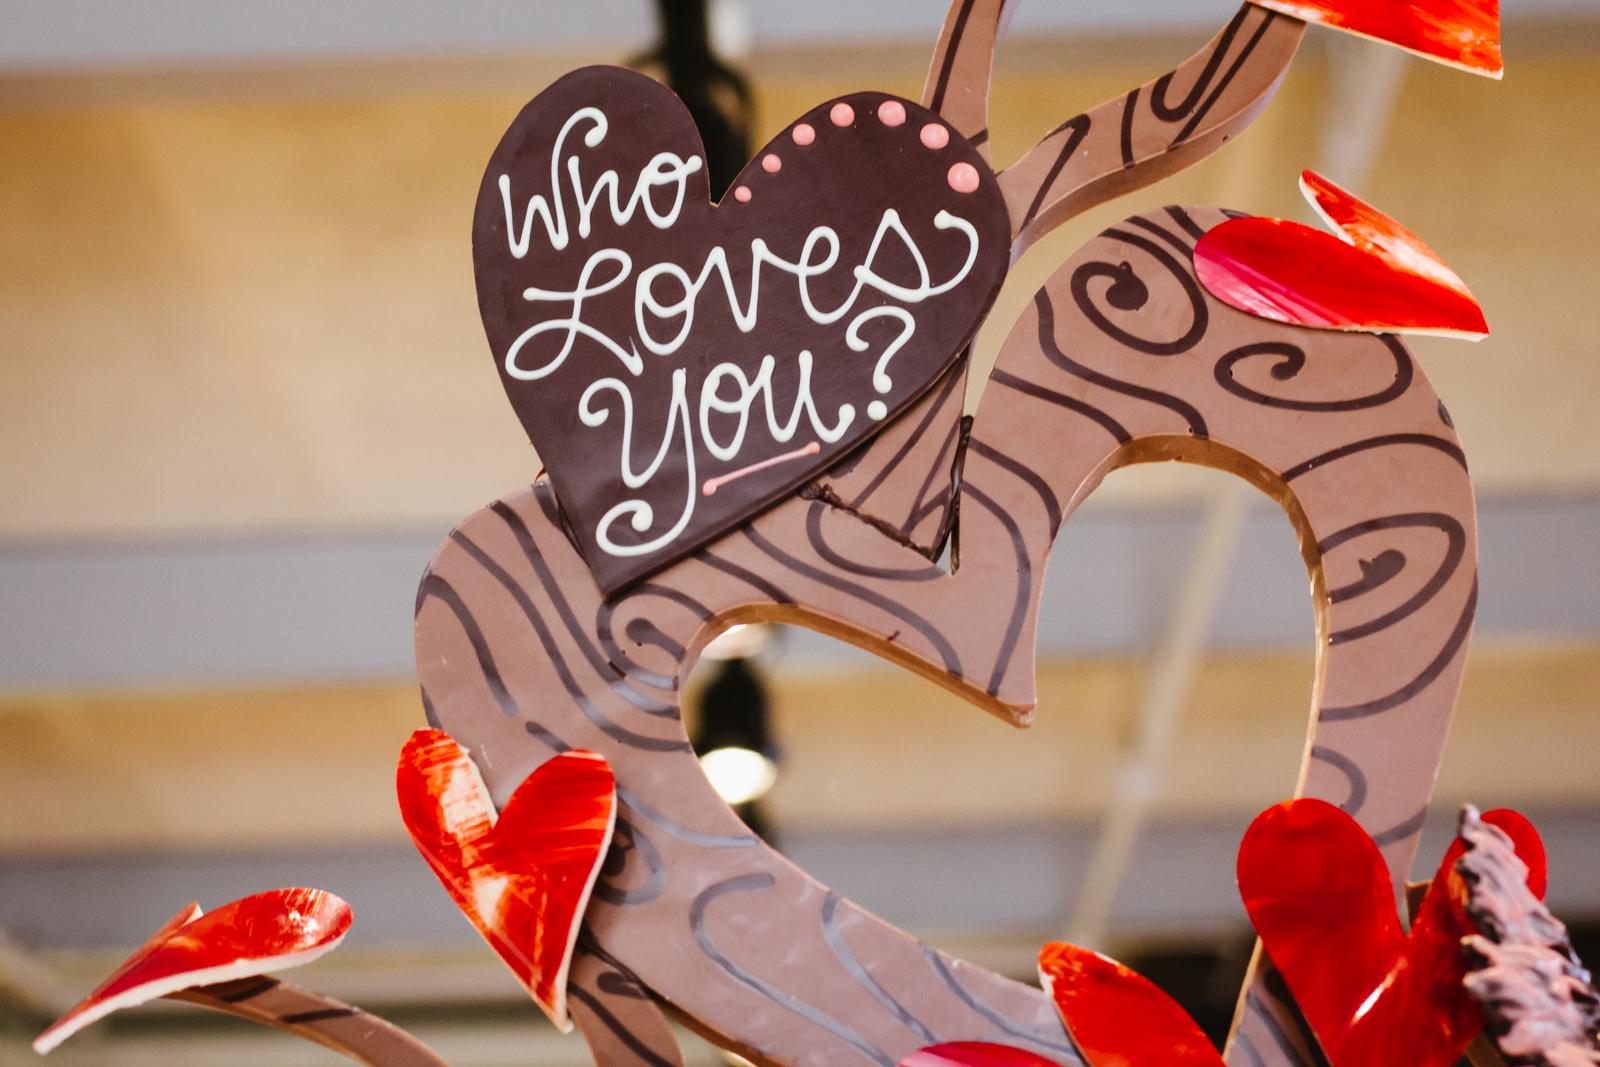 wholovesyouchocolatesculpture